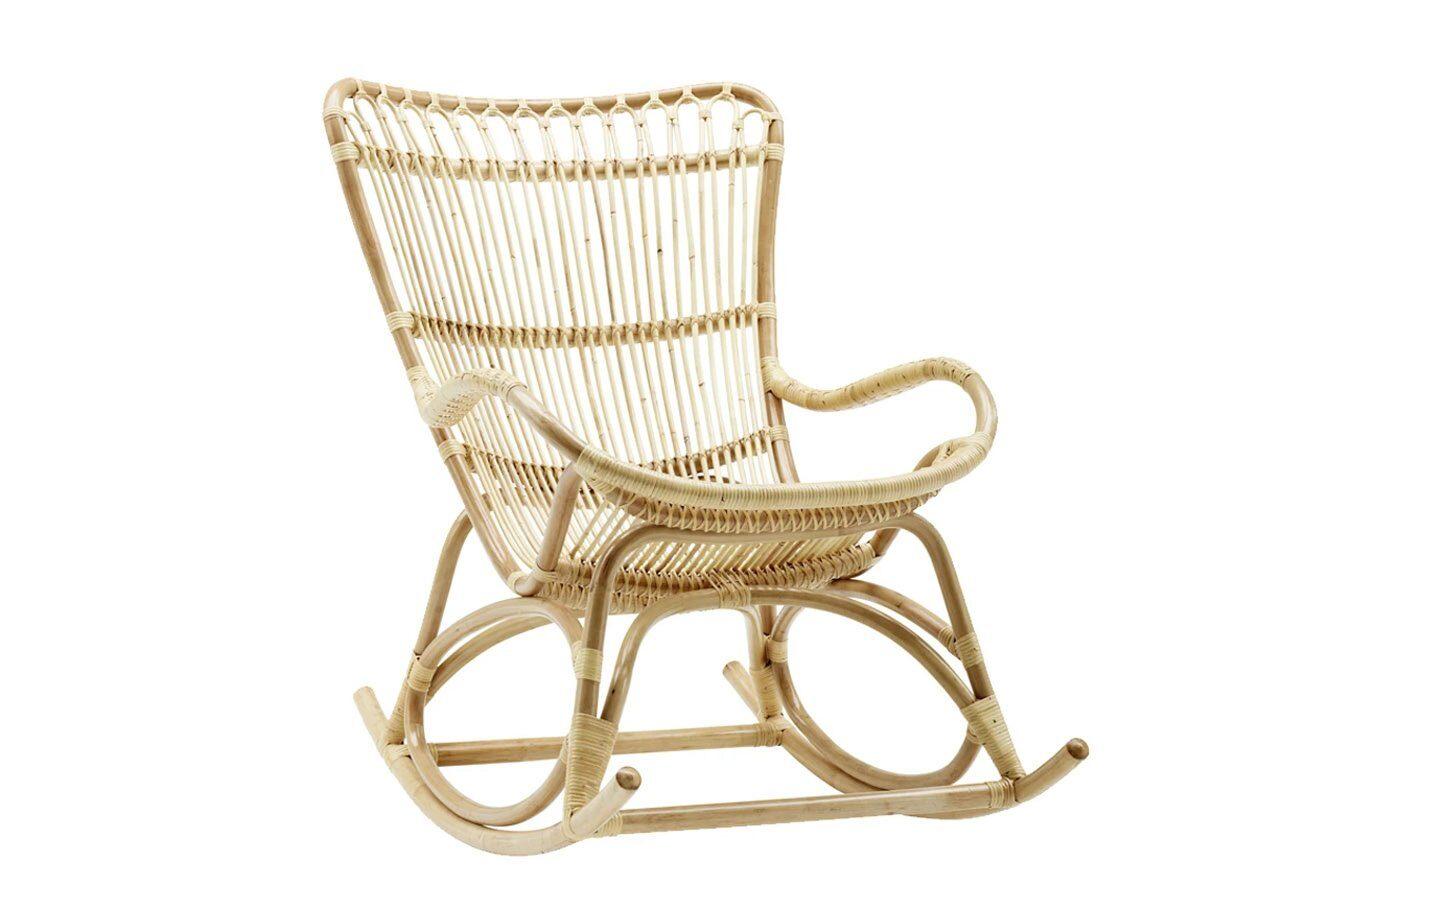 Monet-Rattan-Rocking-Chair-fabiia-02